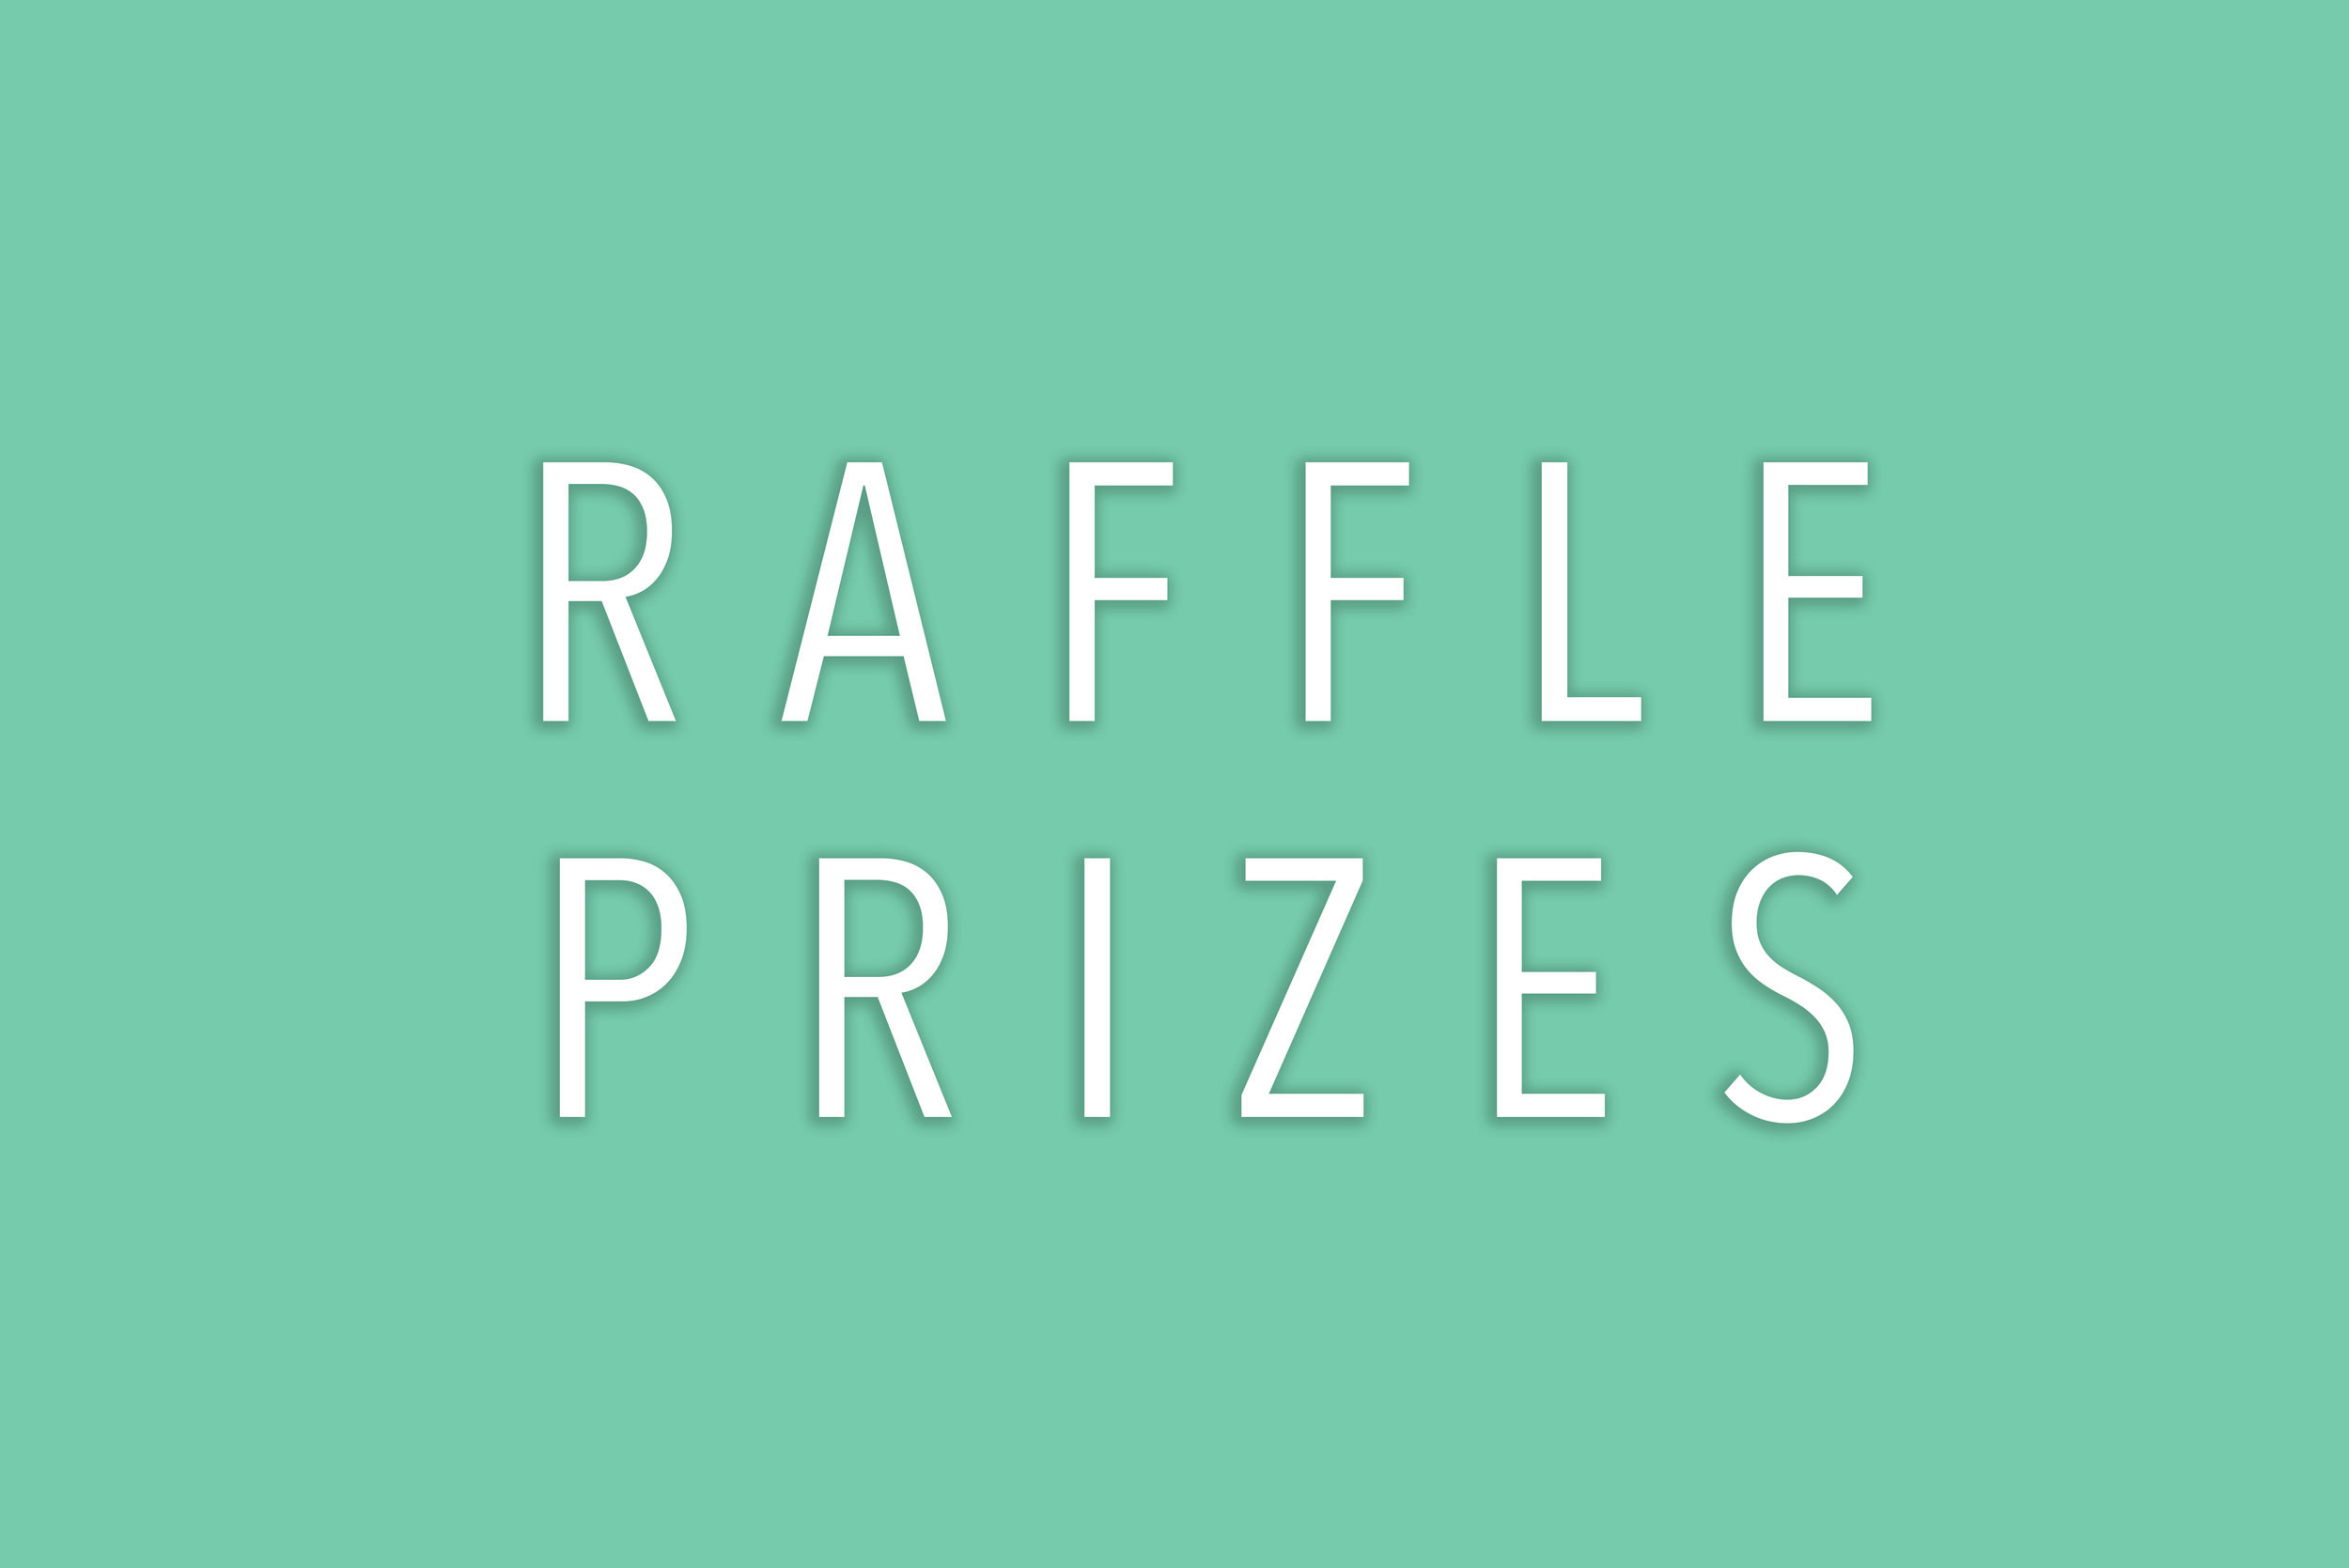 raffle prizes.jpg